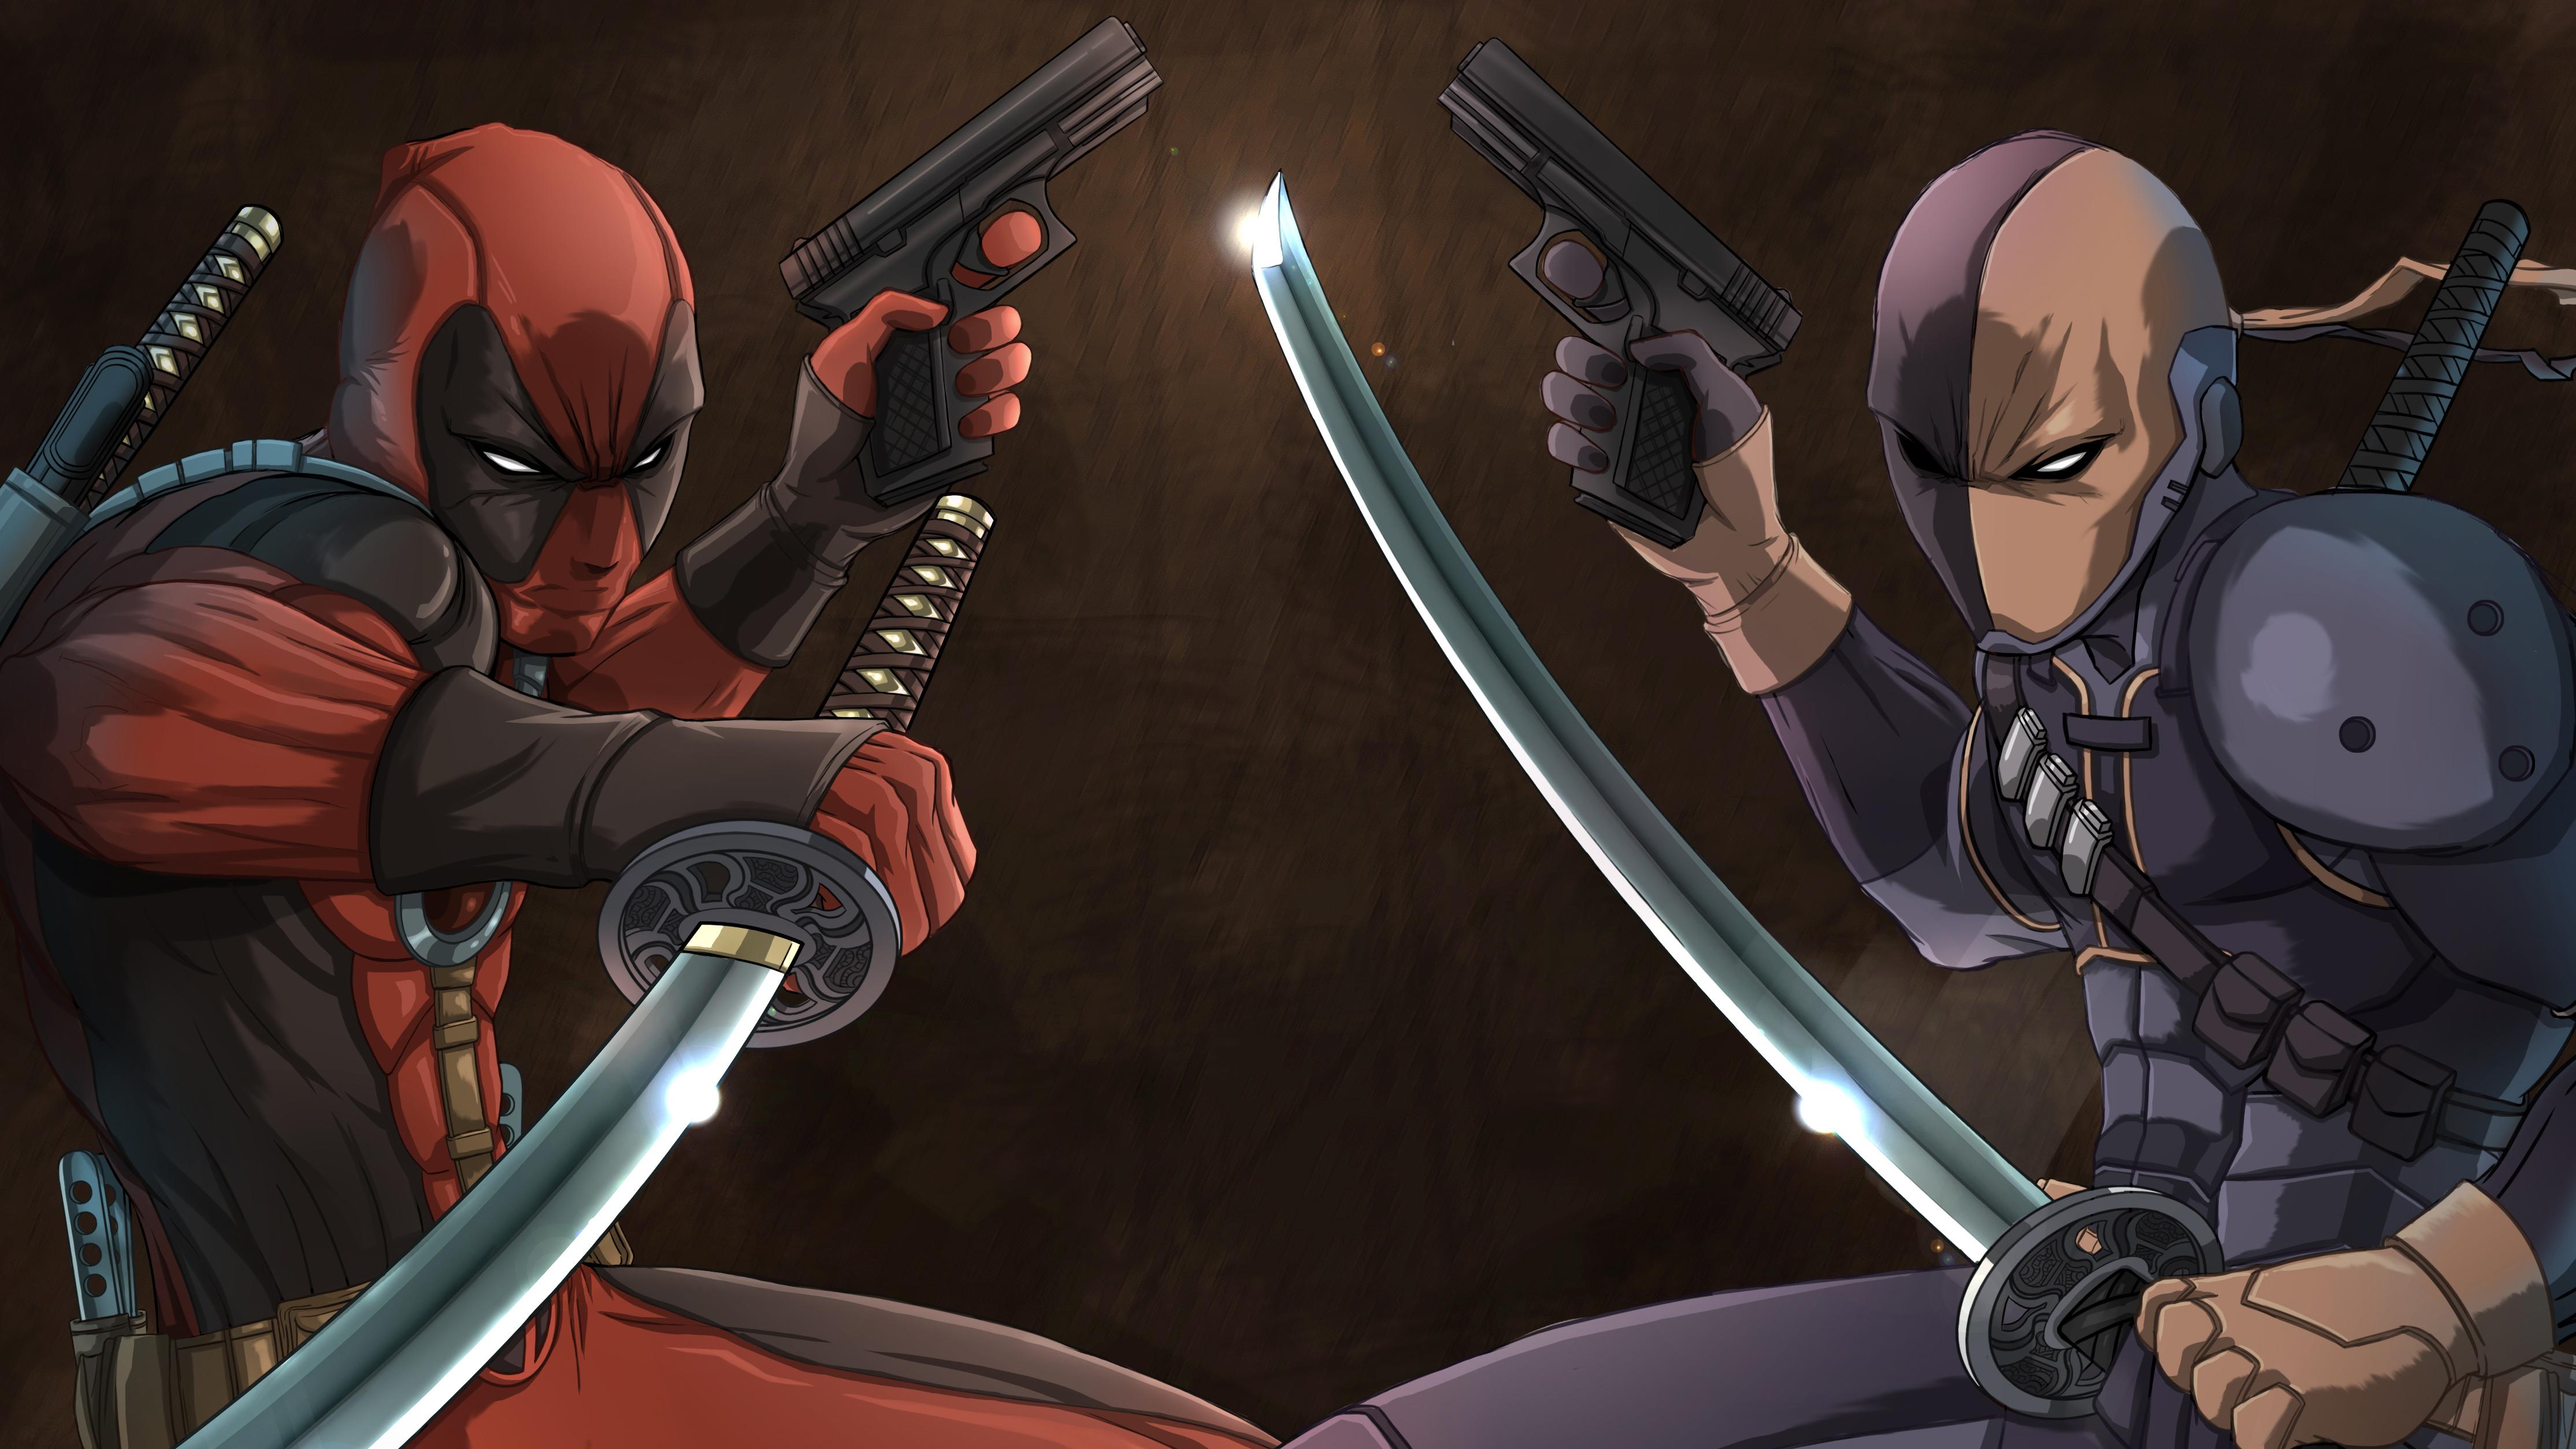 deadpool vs deathstroke 4k 1548527189 - Deadpool Vs Deathstroke 4k - superheroes wallpapers, hd-wallpapers, digital art wallpapers, deviantart wallpapers, deathstroke wallpapers, deadpool wallpapers, artwork wallpapers, 4k-wallpapers